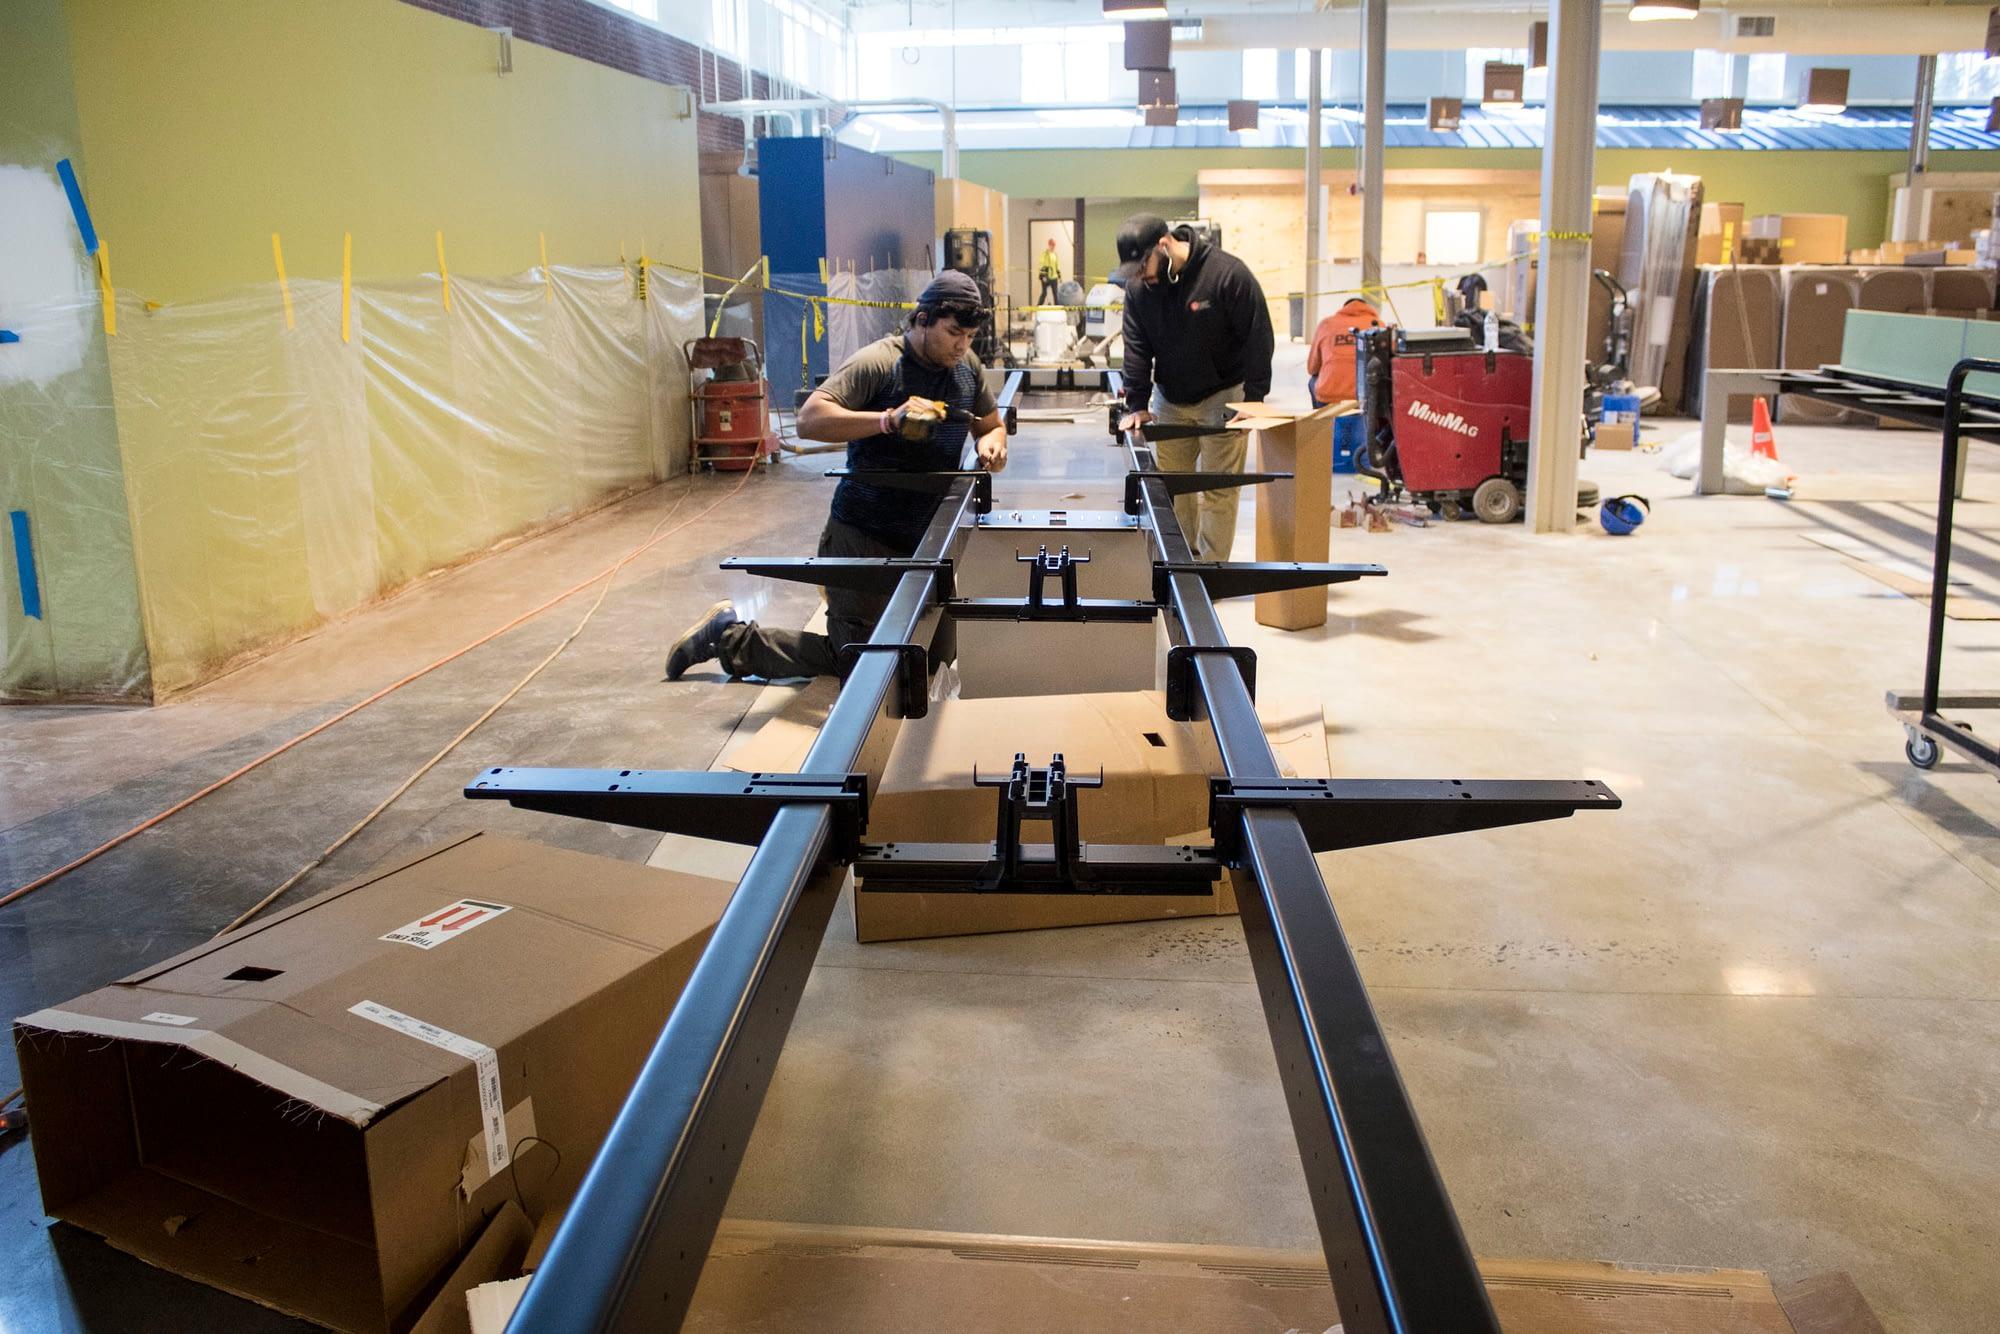 installers assembling benching